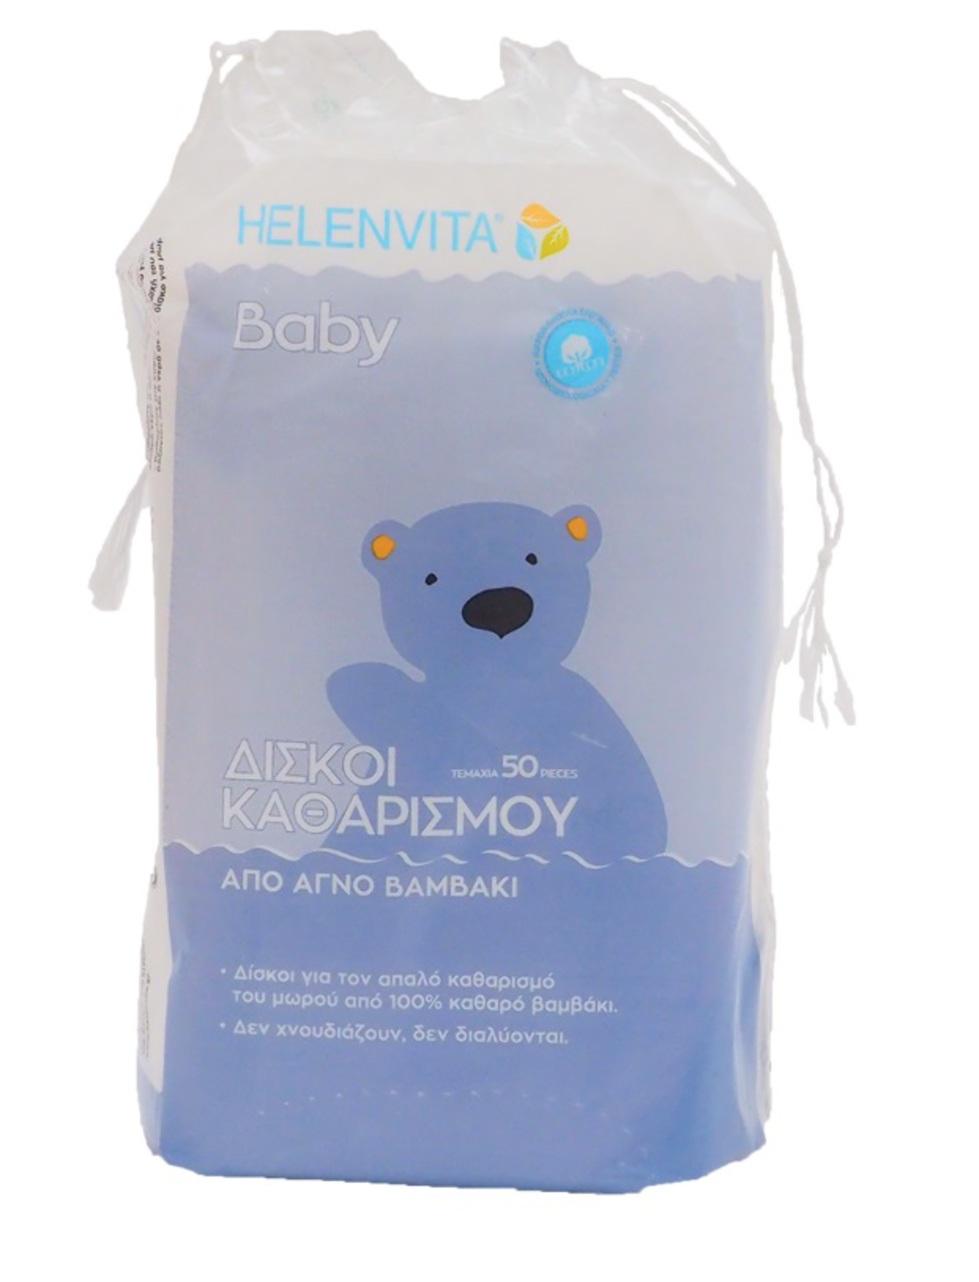 Helevita Baby Δίσκοι Καθαρισμού 50 τμχ